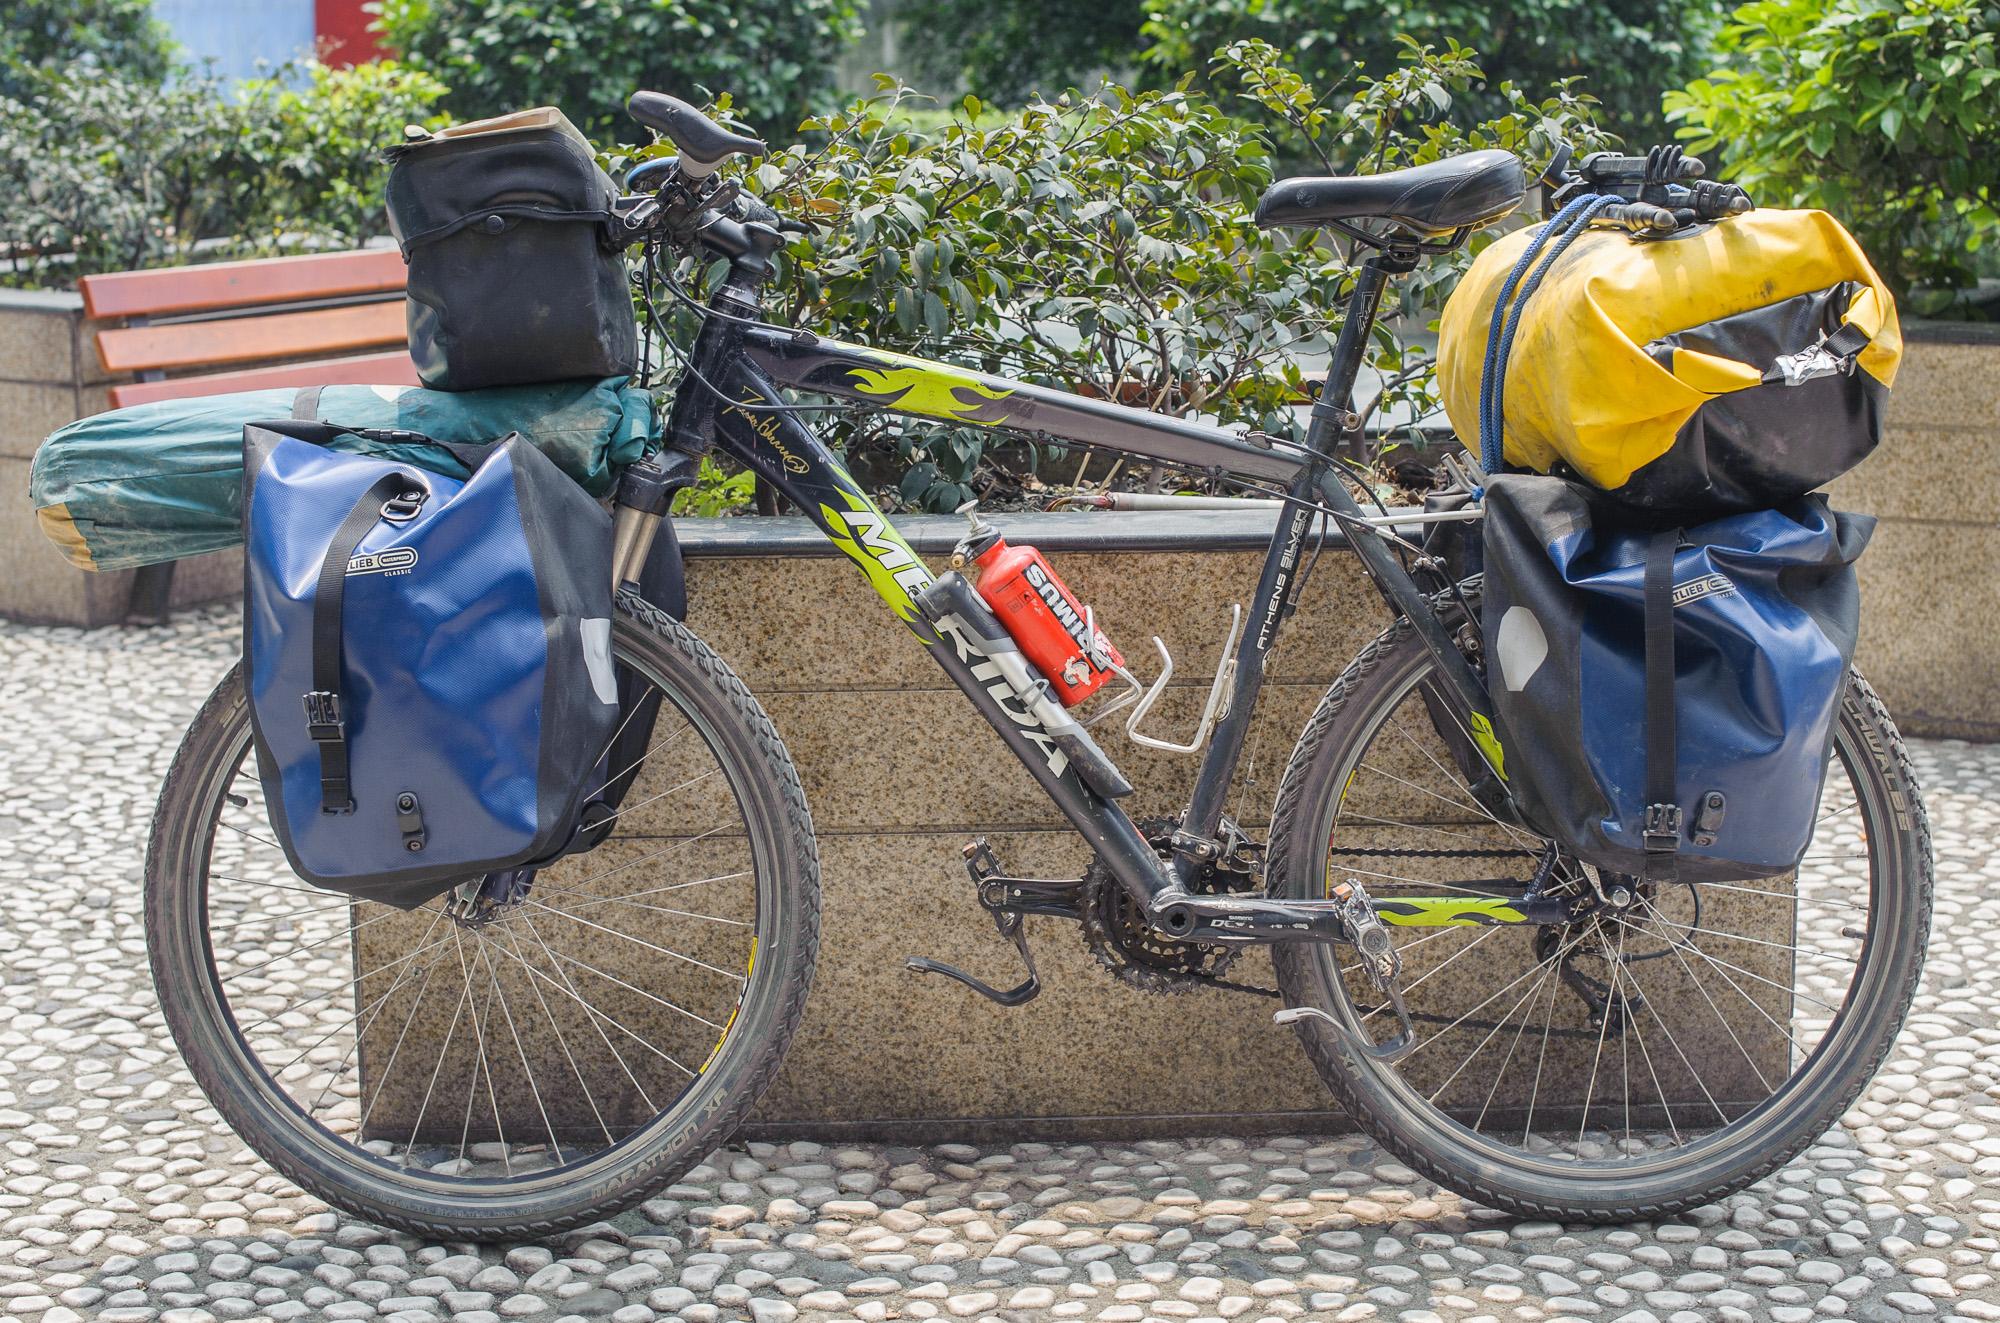 First bike - Mérida MTB